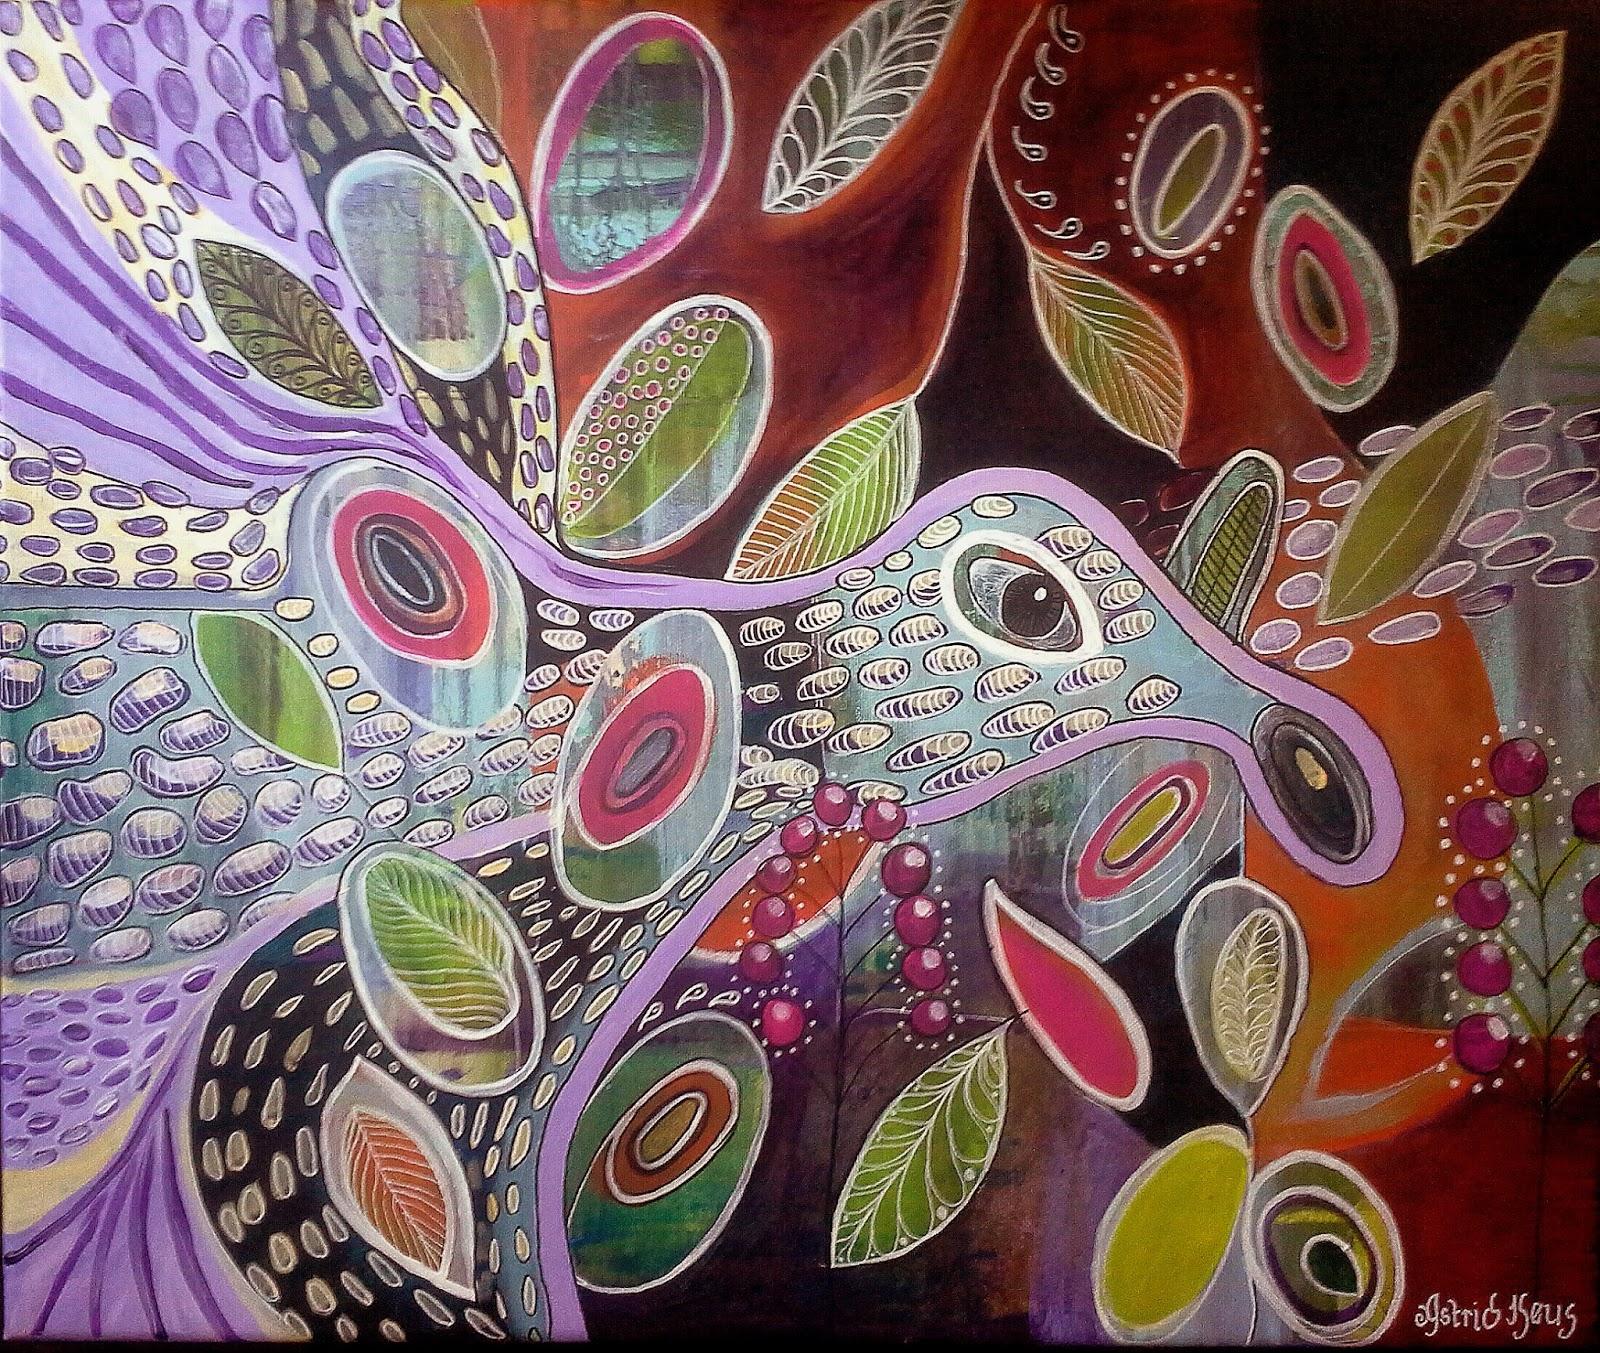 Bird of Seeds Astrid Keus July 2015